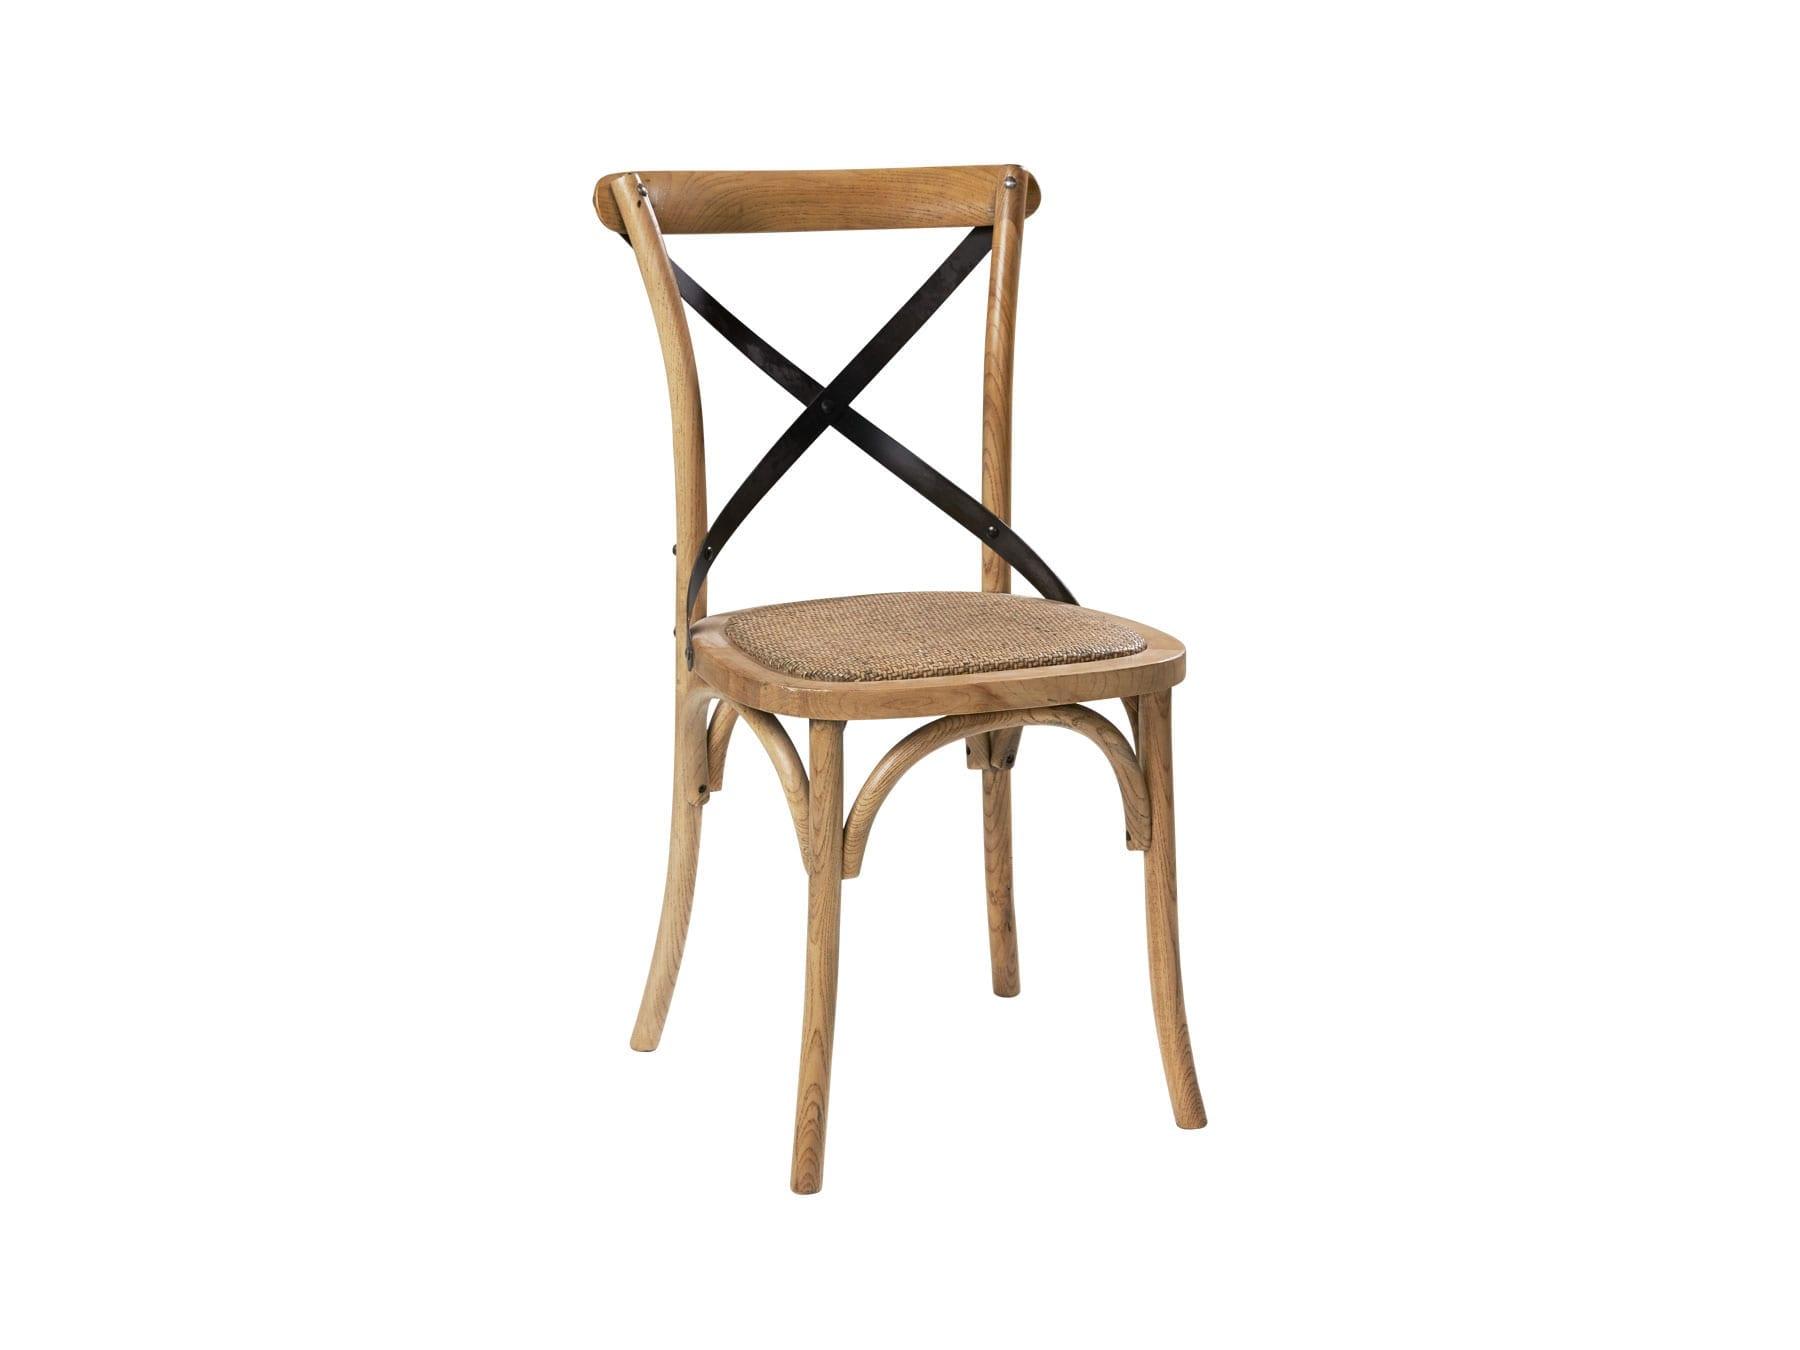 Beautiful Cross Back Dining Chairs Elegant  : wilson crossback from inmunoanalisis.com size 1800 x 1350 jpeg 103kB